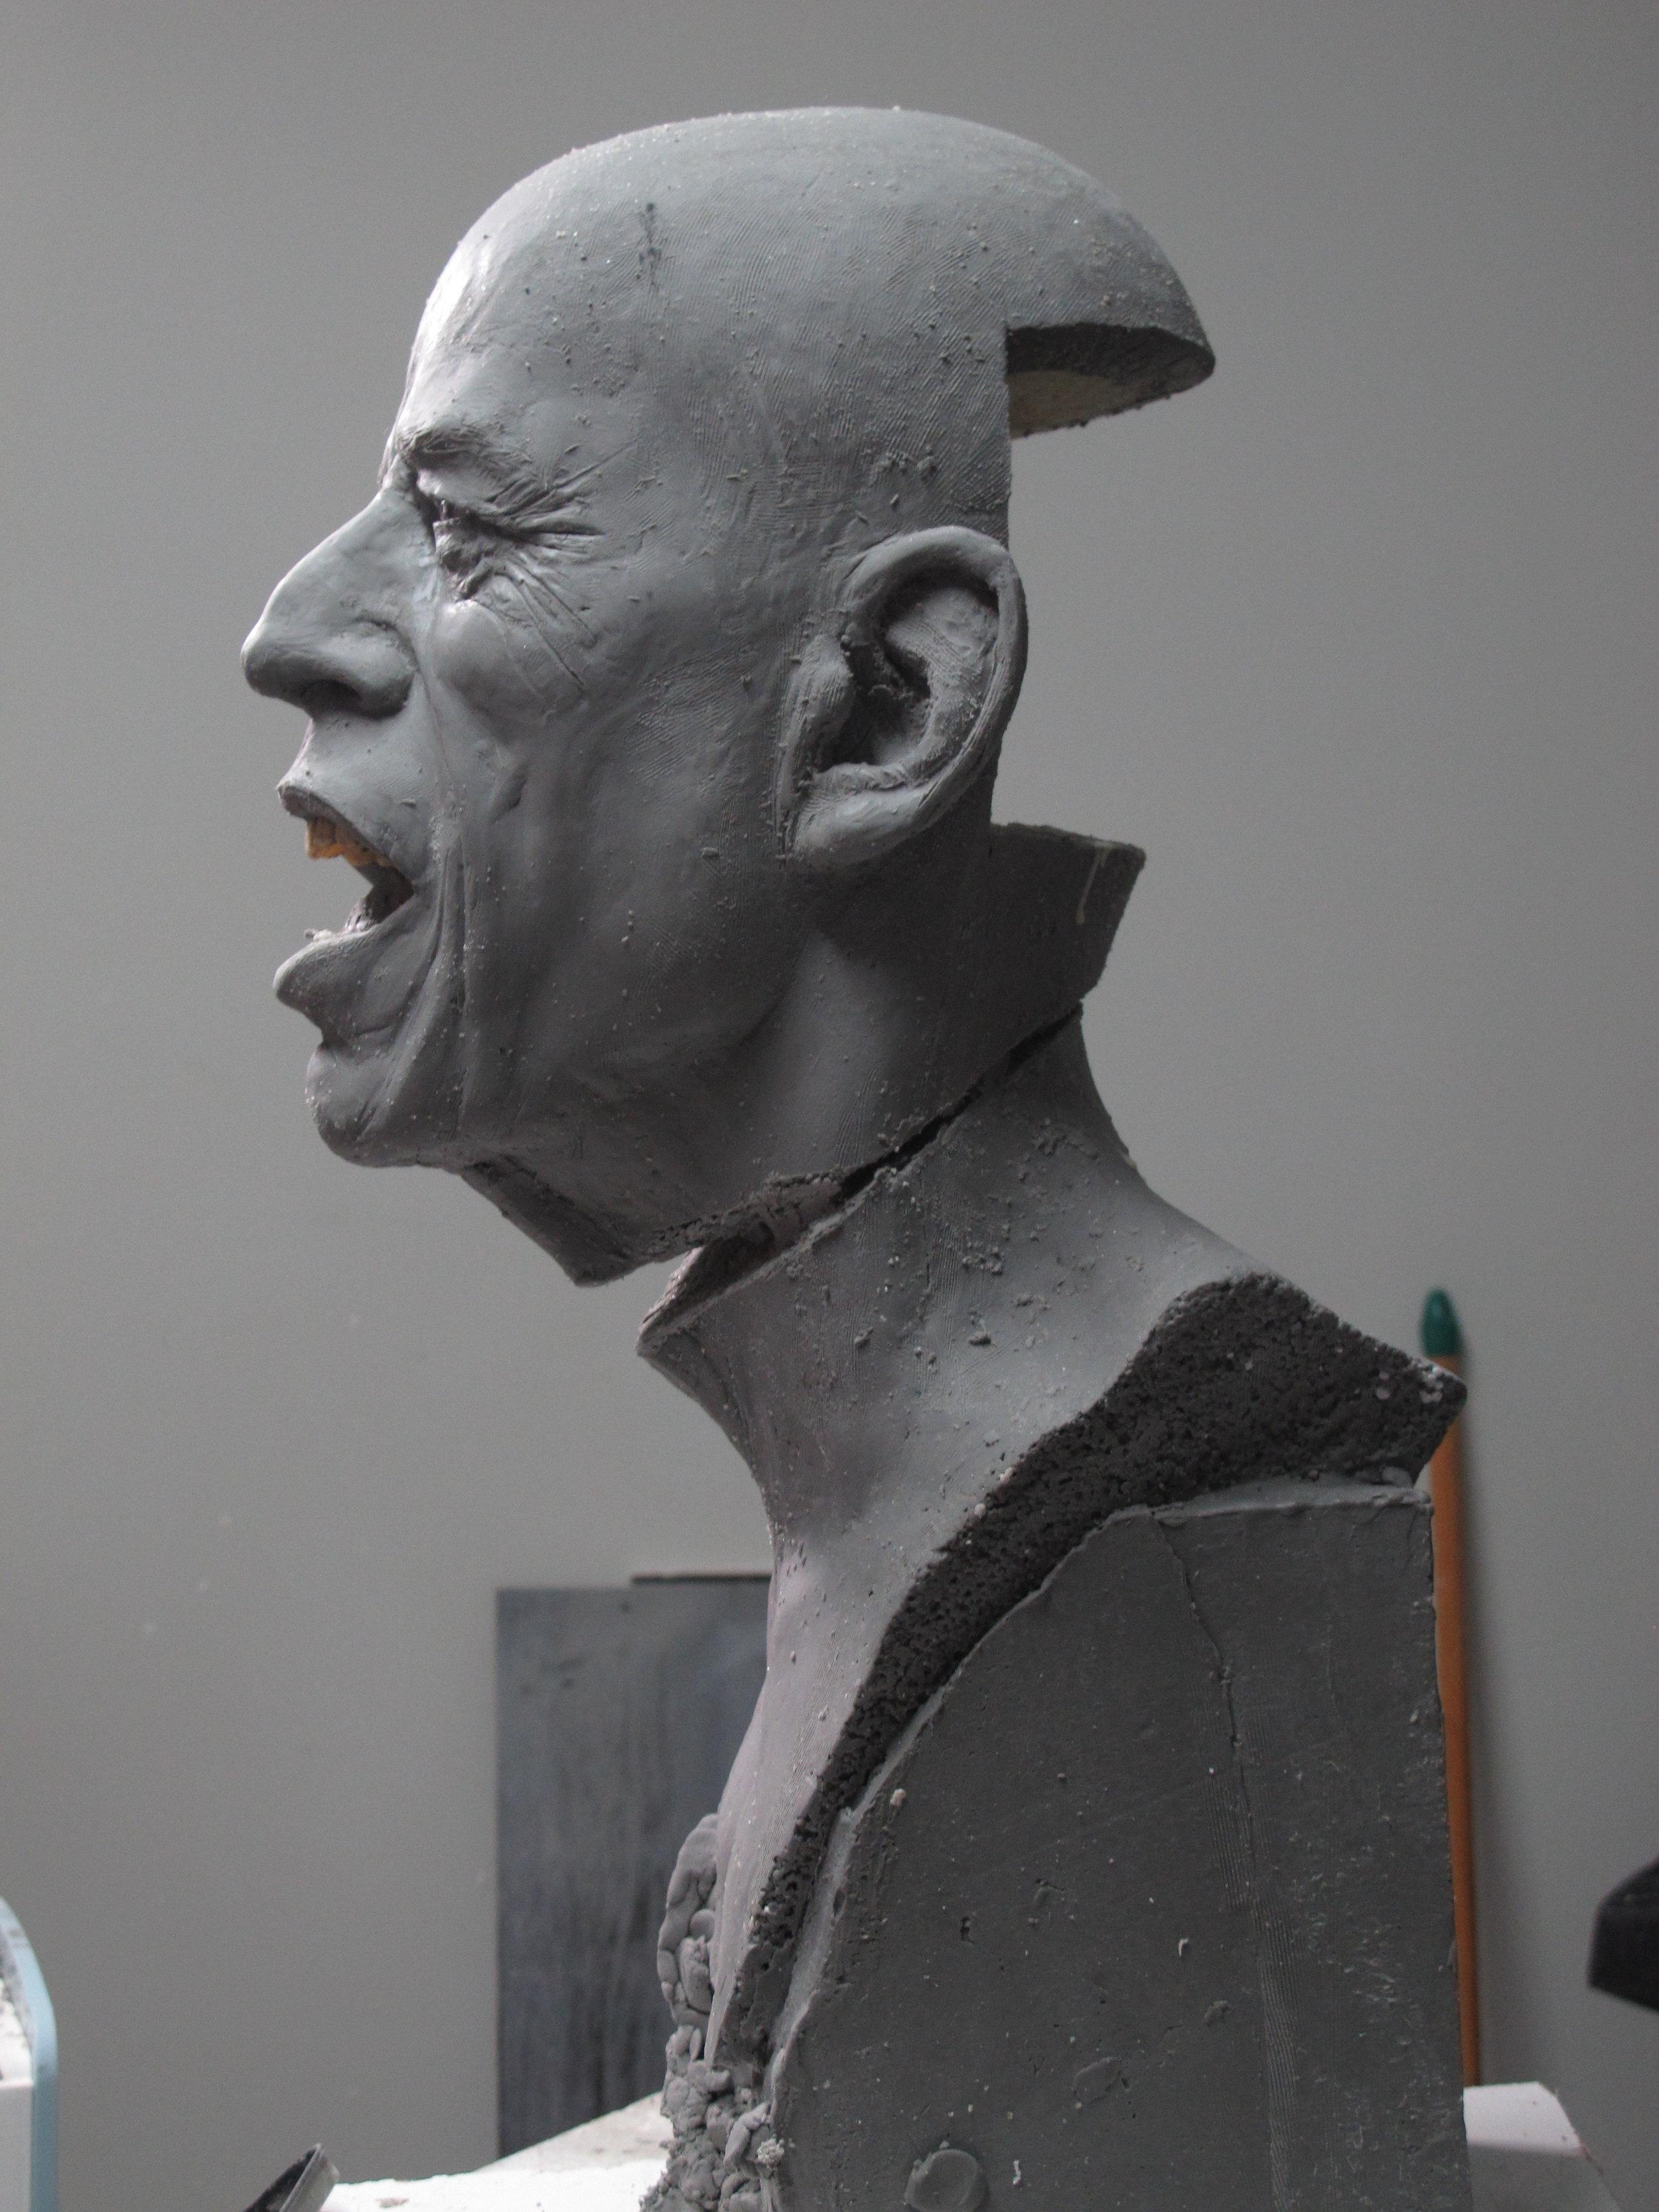 Mick Jagger - Clay sculpture by Eric Saint Chaffray - Credit Musée Grévin